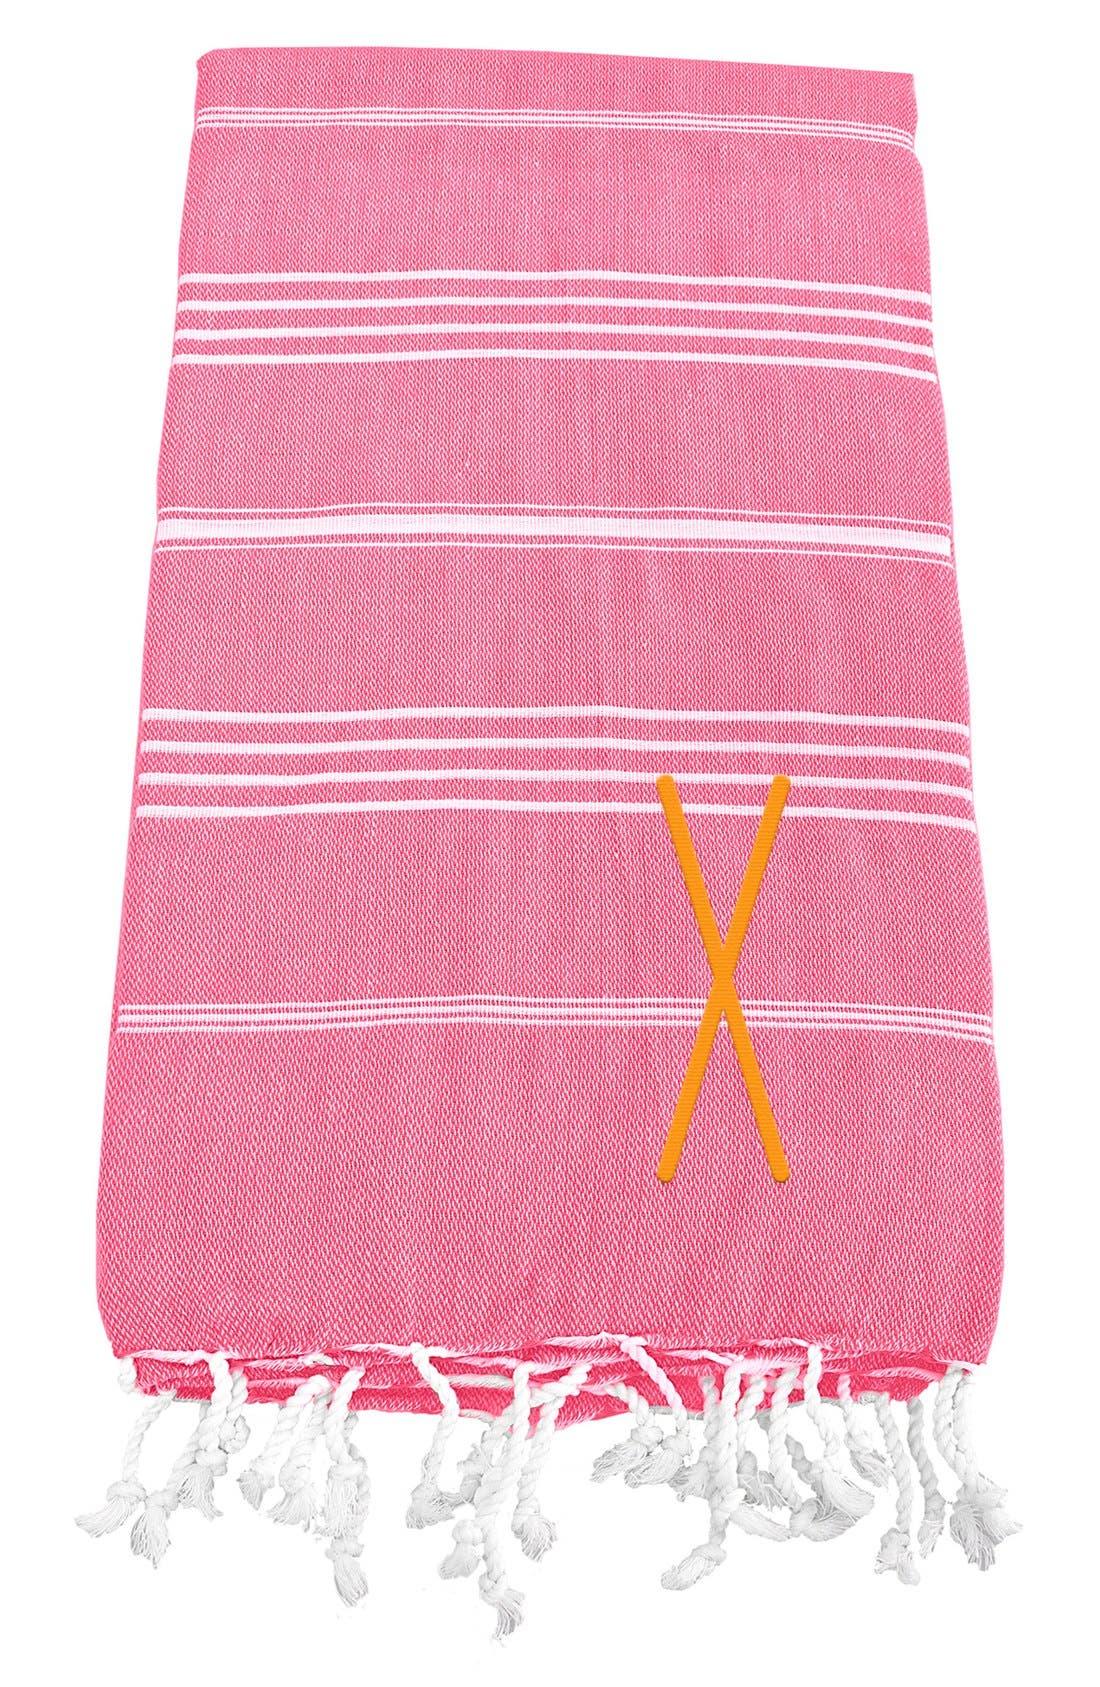 Monogram Turkish Cotton Towel,                             Main thumbnail 160, color,